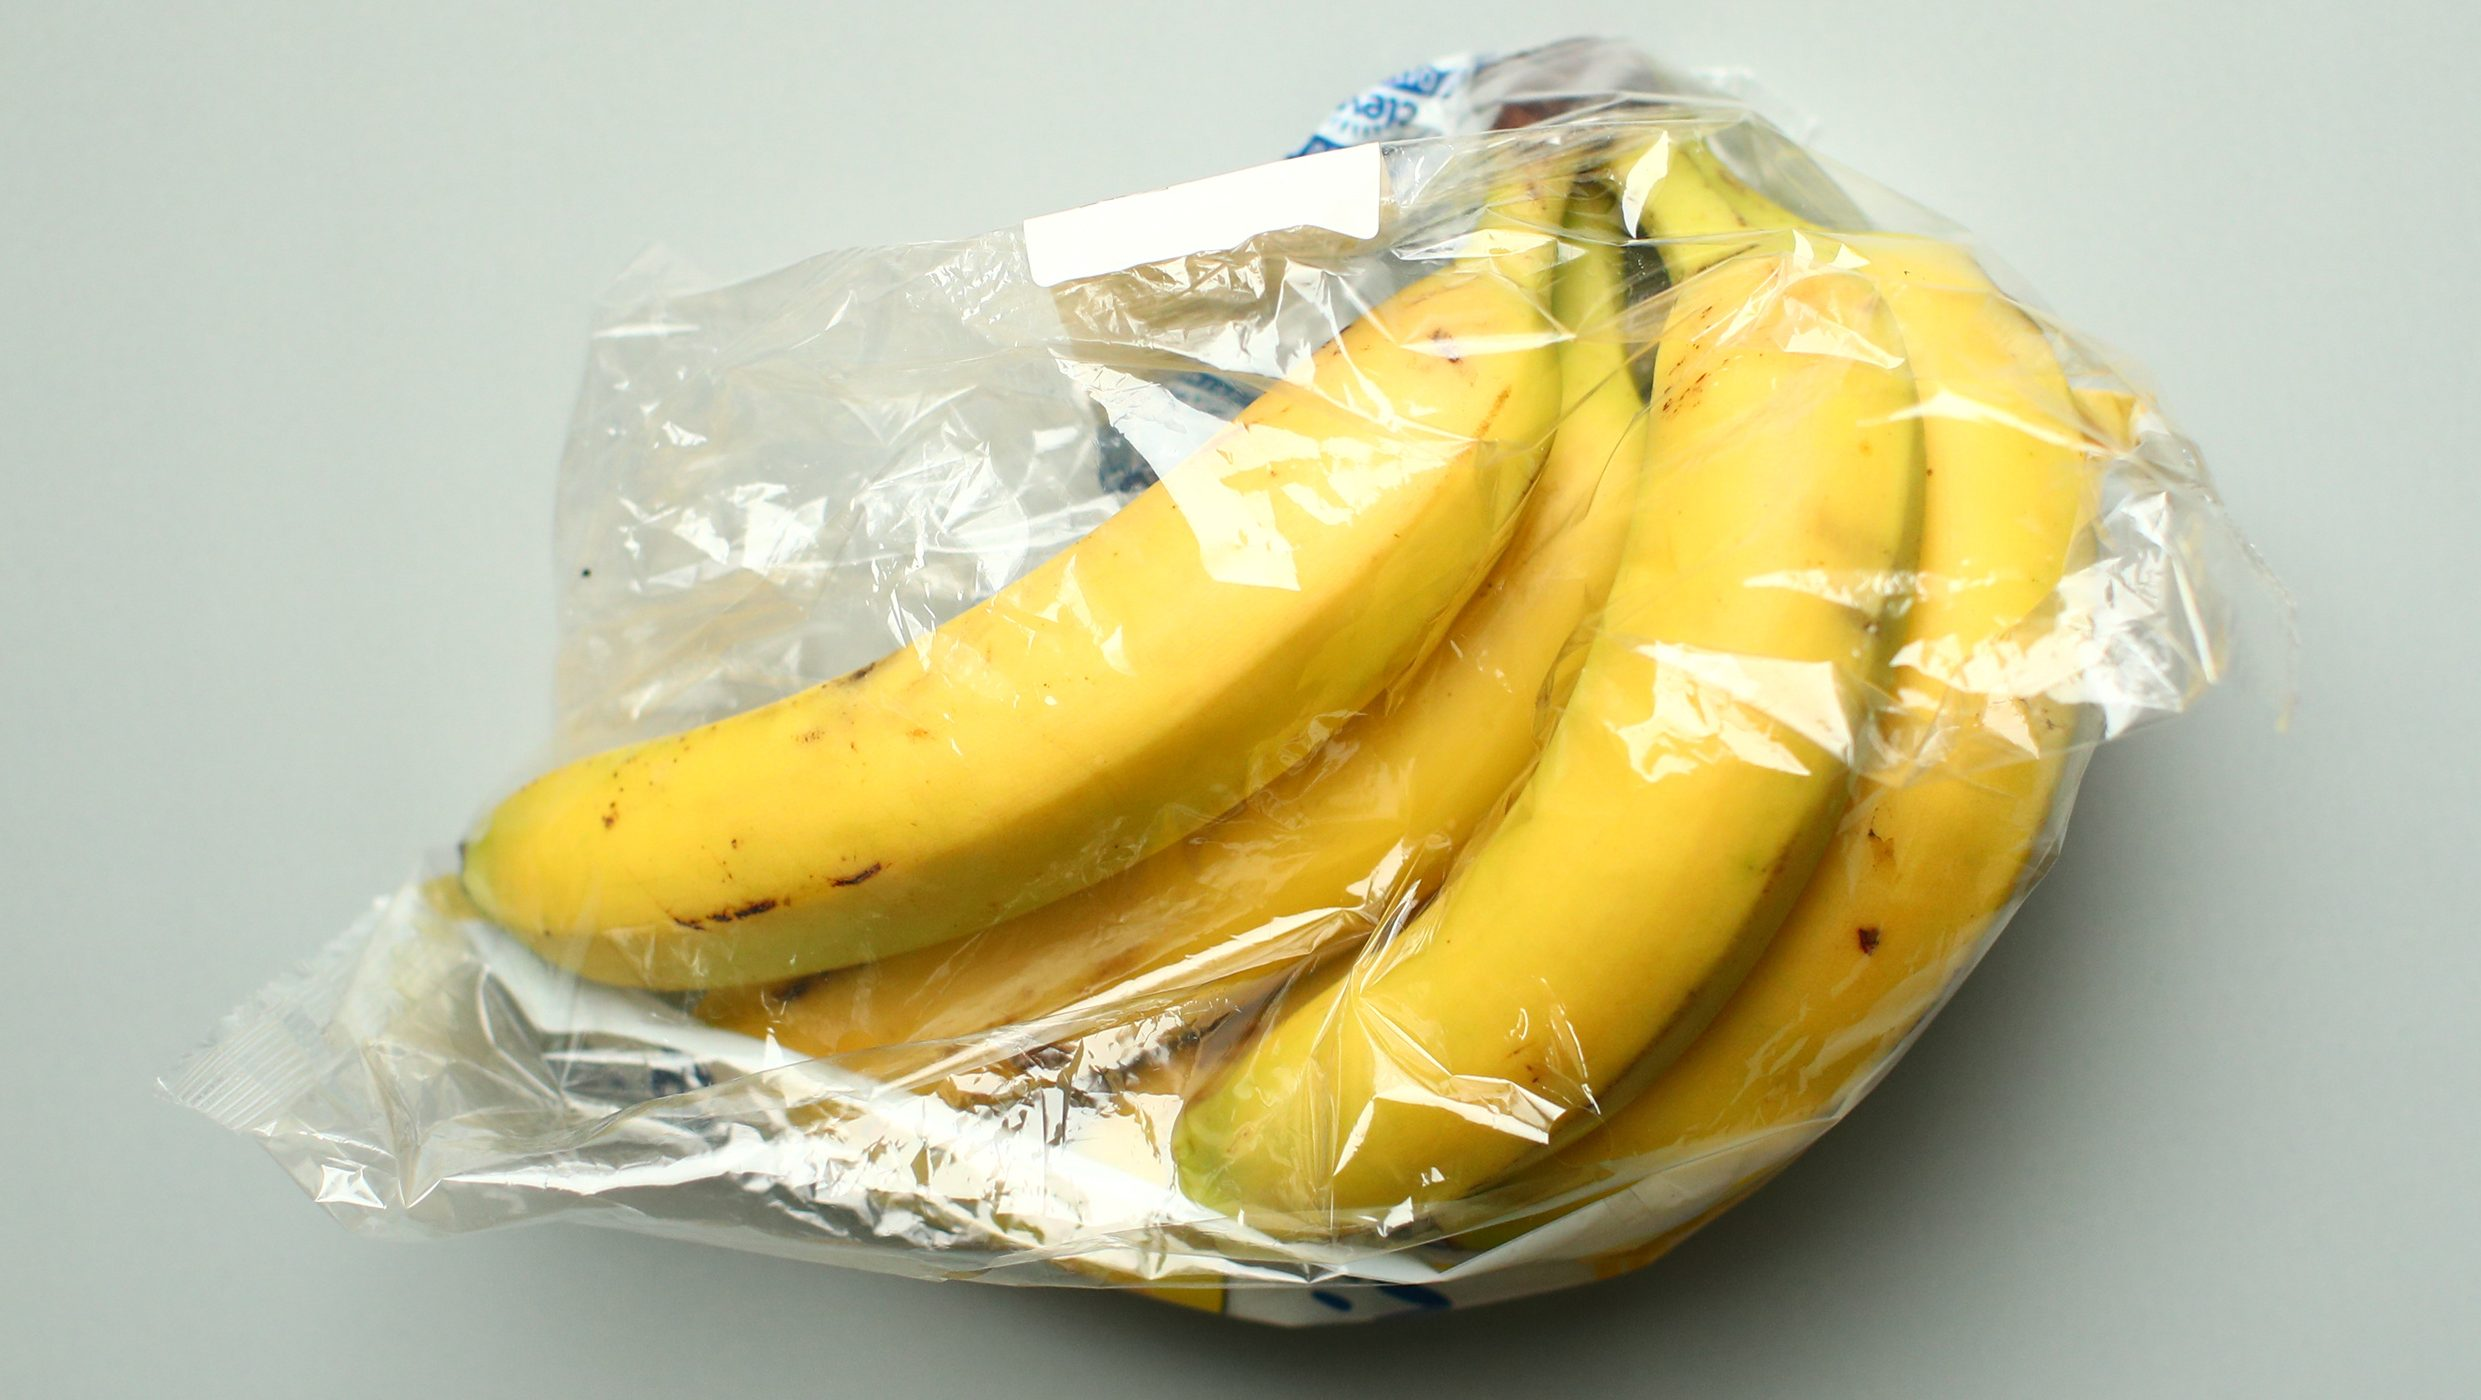 [Image: Plastic-wrapped-bananas-e1561738871623.j...200&h=1806]